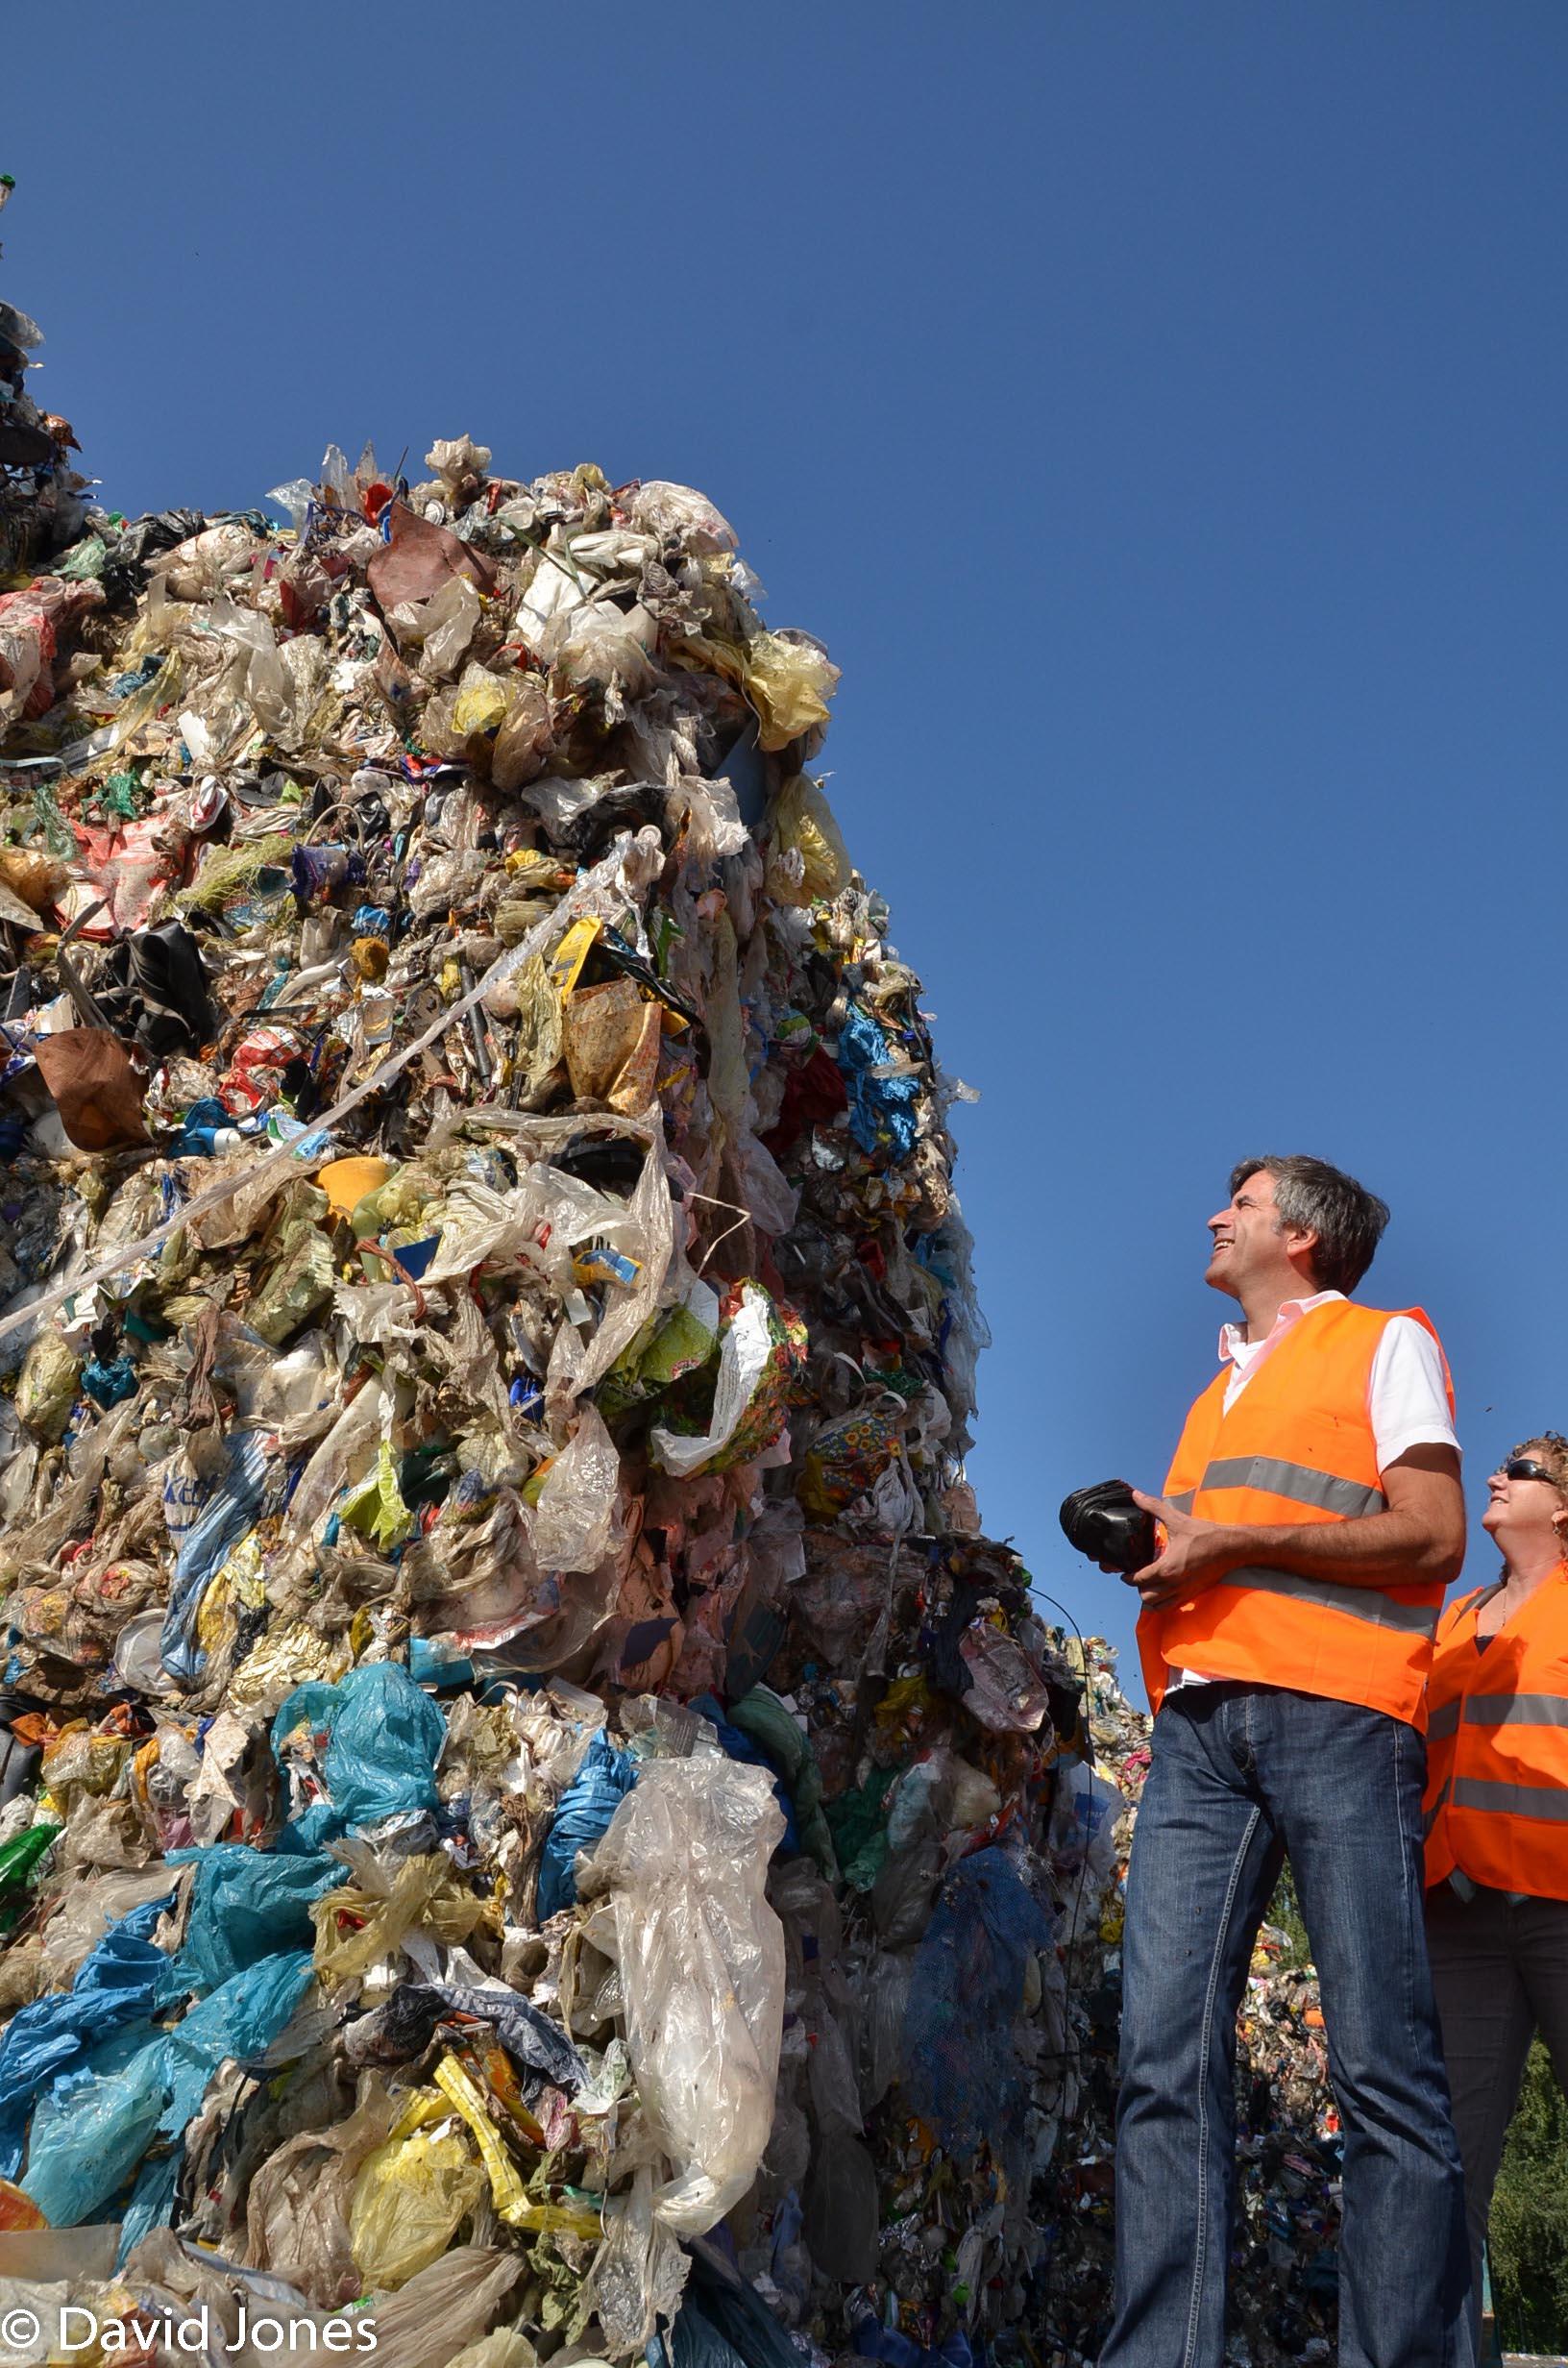 So much plastic waste